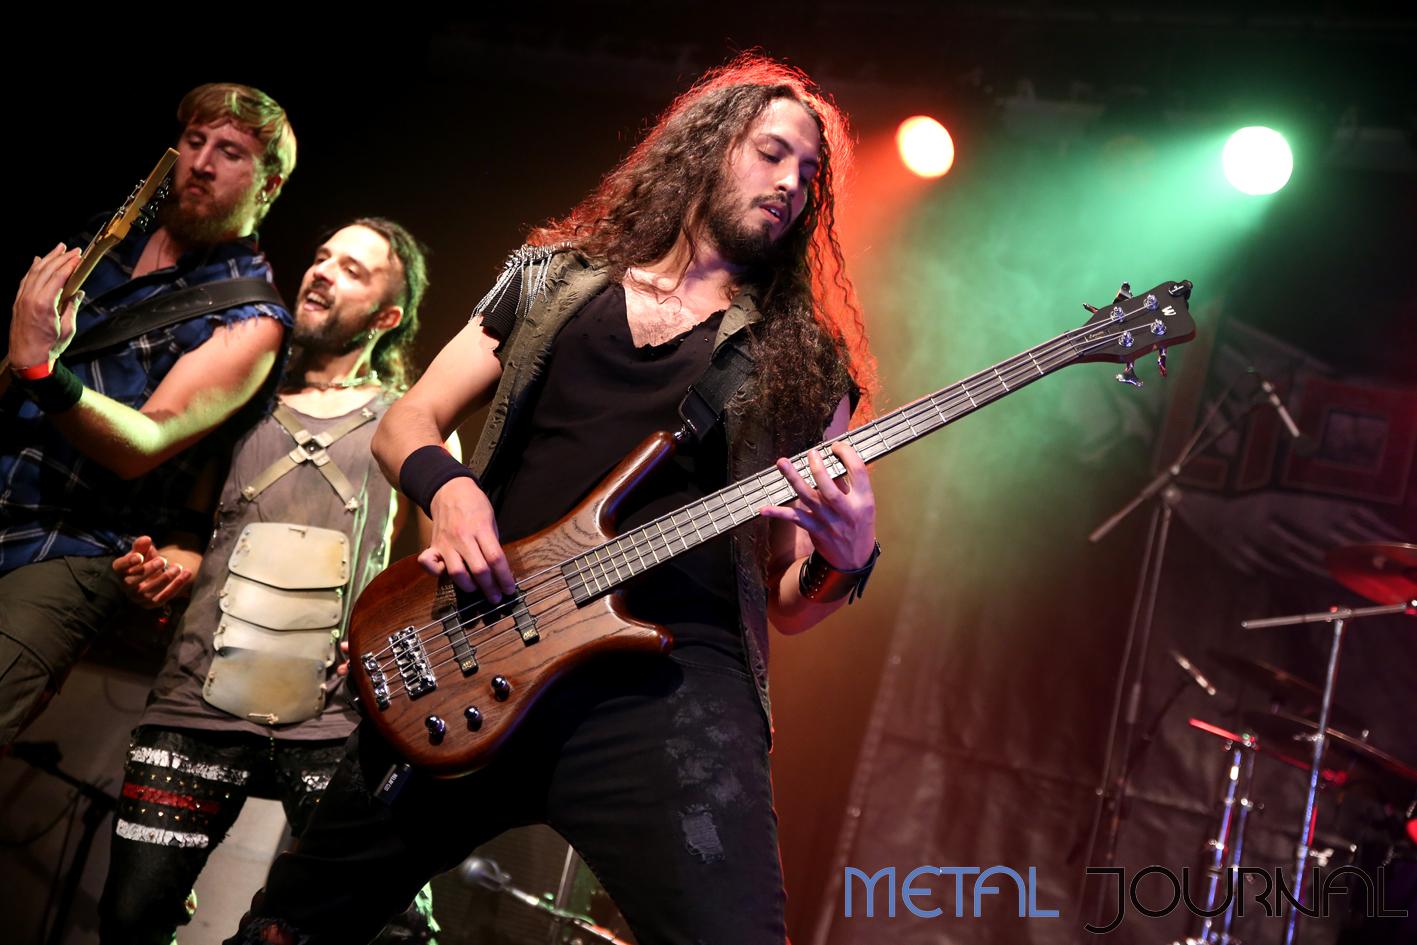 lionsoul metal journal 2018 pic 4